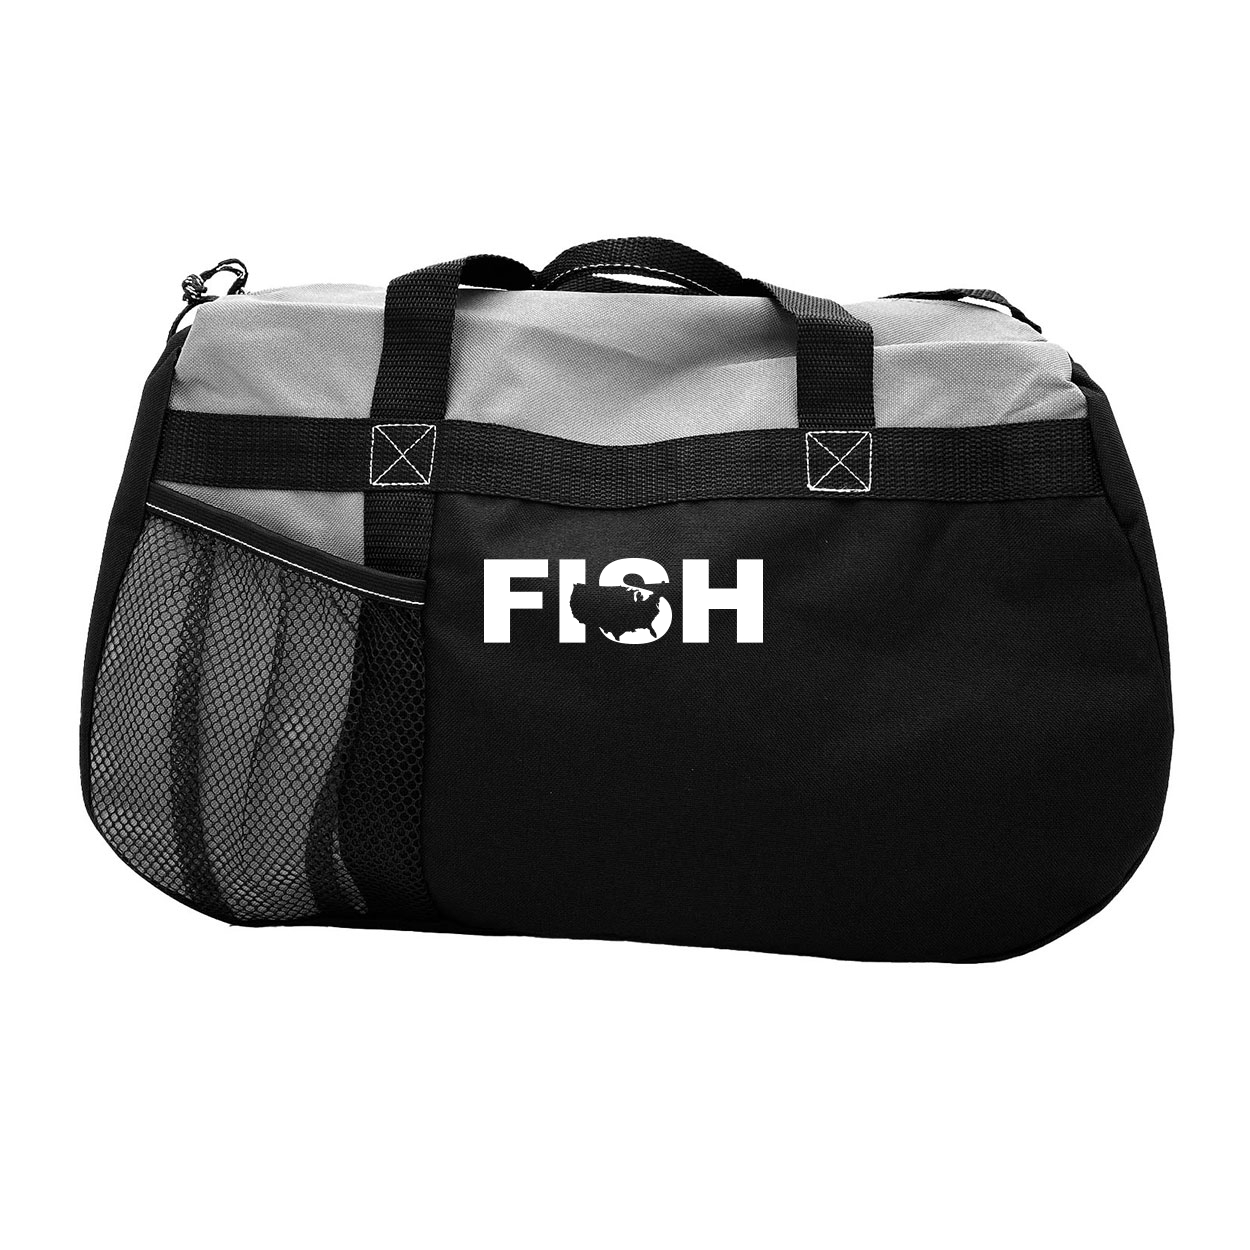 Fish United States Classic Sequel Sport Duffel Bag Black (White Logo)